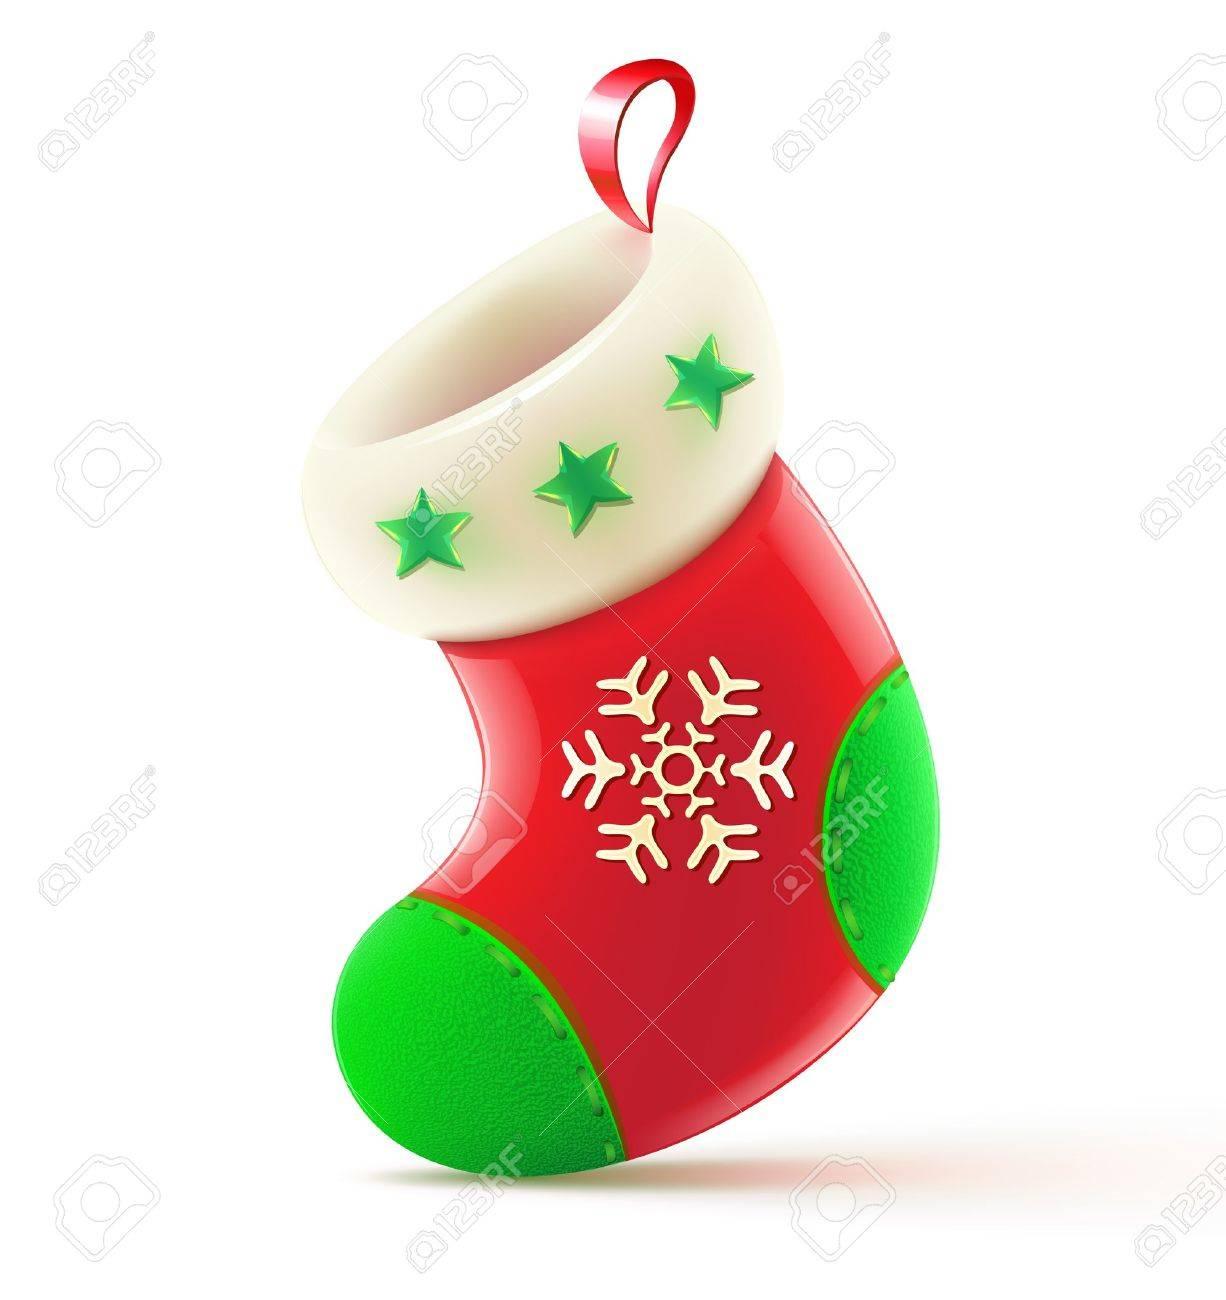 Vector illustration of shiny red Christmas stocking waiting for Santa - 10653255